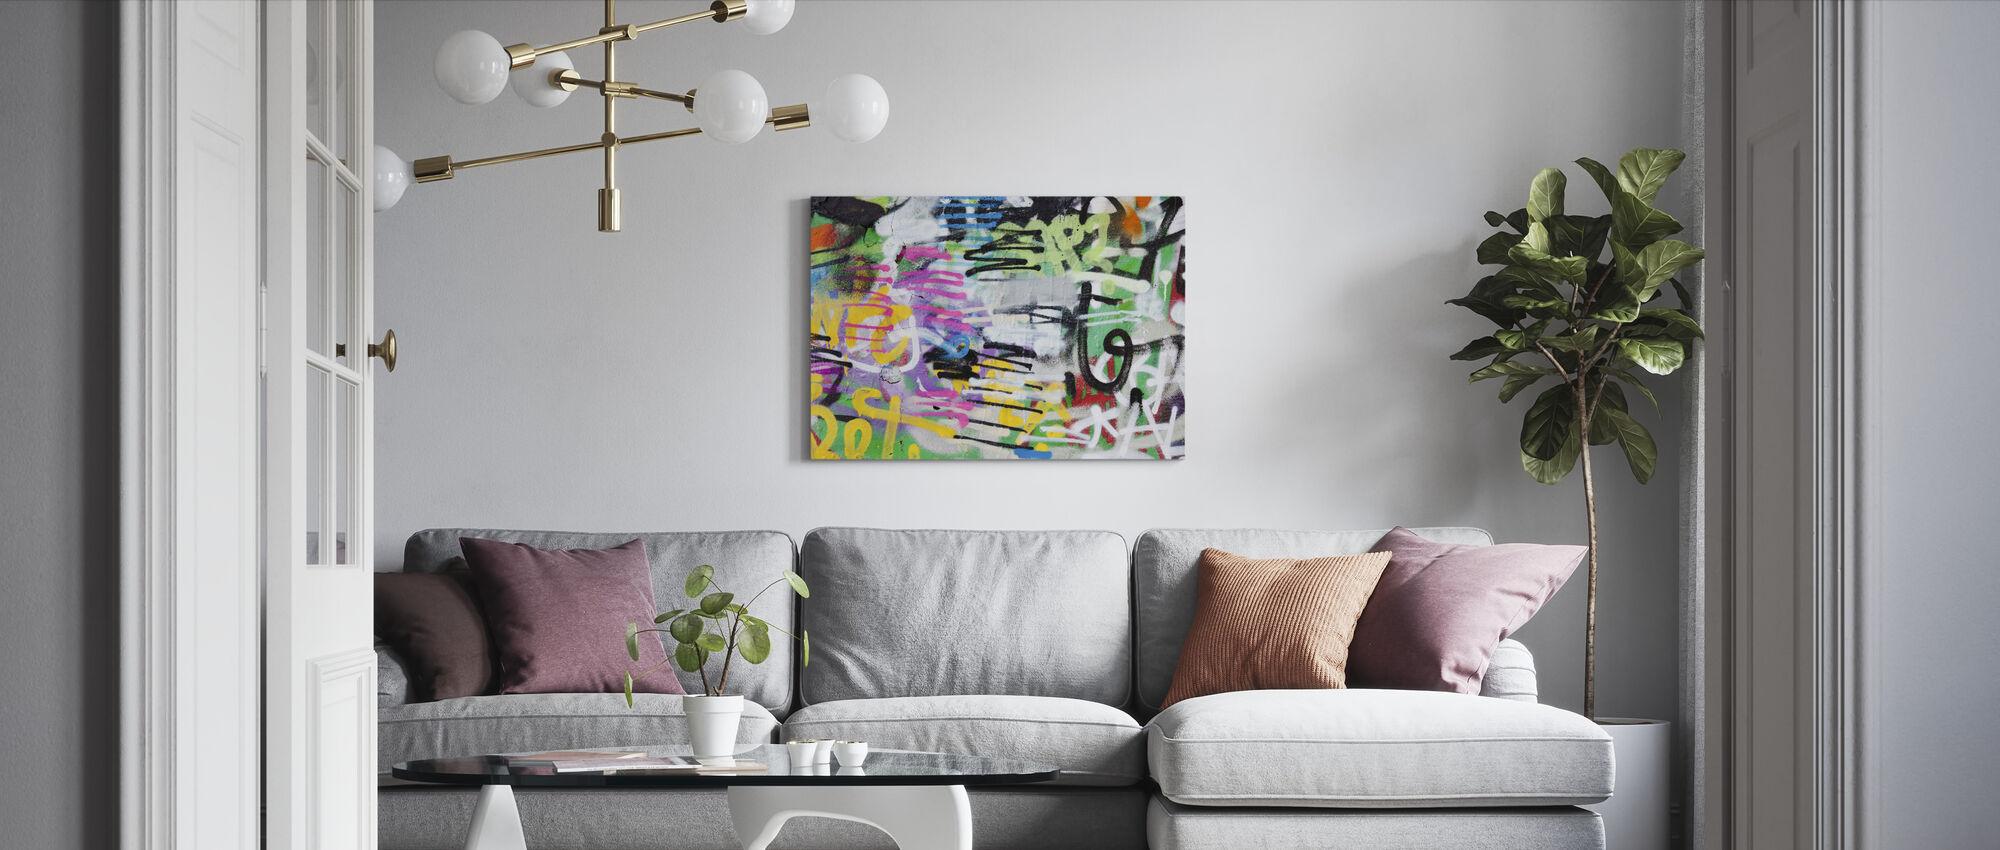 Painted Graffiti Wall - Canvas print - Living Room